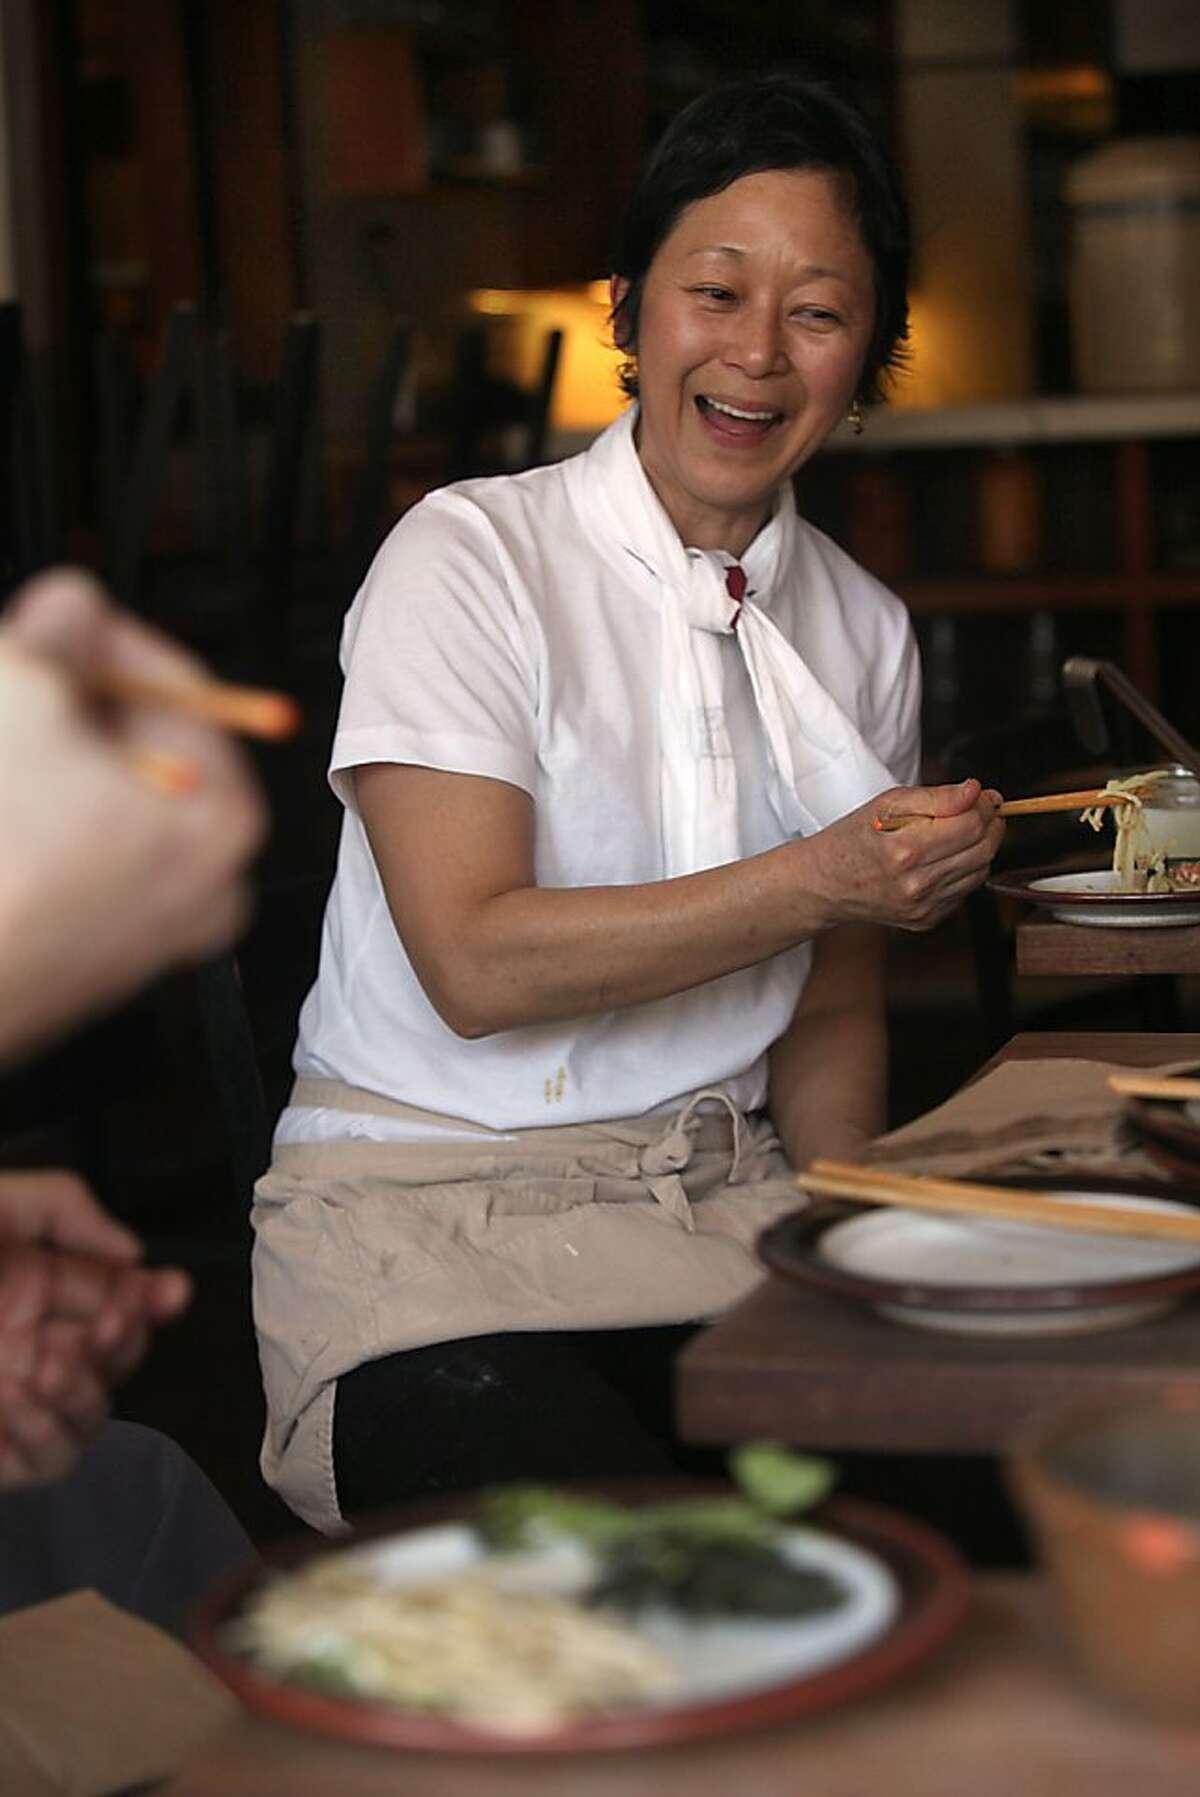 Artisan food purveyor Sonoko Sakai tastes her dish at Bar Tartine in San Francisco, California, on Tuesday, April 30, 2013. She is meeting with Bar Tartine chefs to finalize a menu for a Koji dinner later in May. Shio Koji is a newly popular seasoning in Japan.